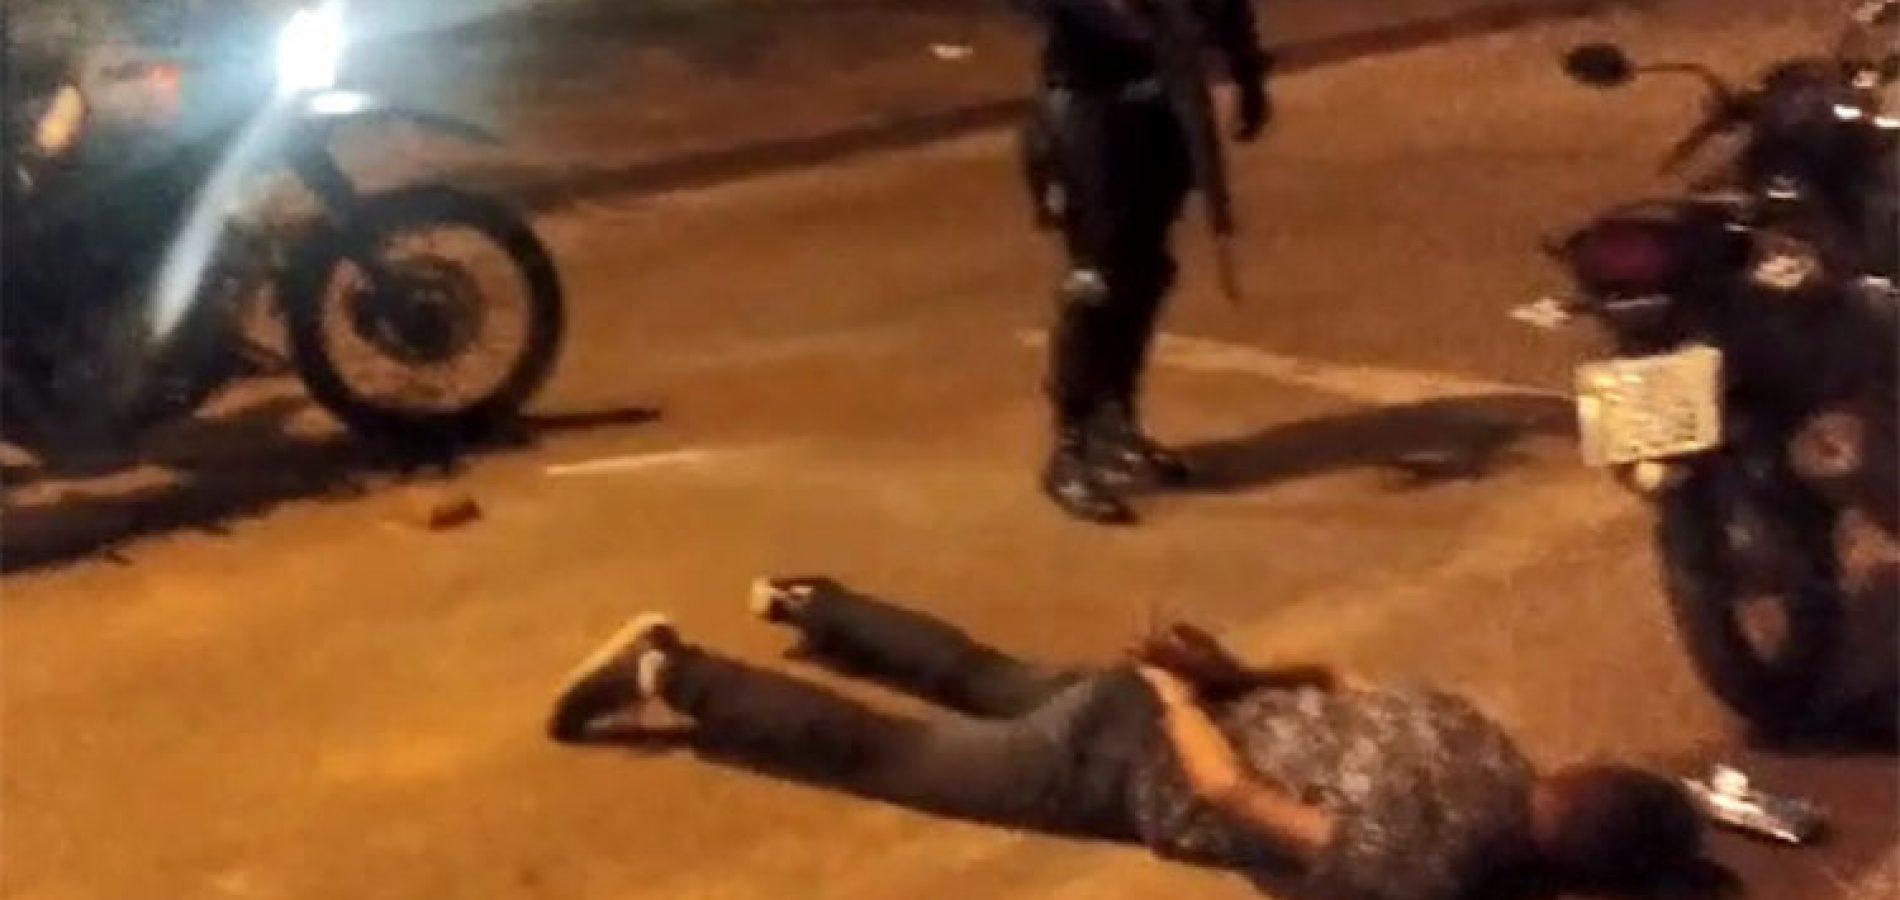 Preso no DF suspeito de participar de esquartejamento de corpos no Piauí